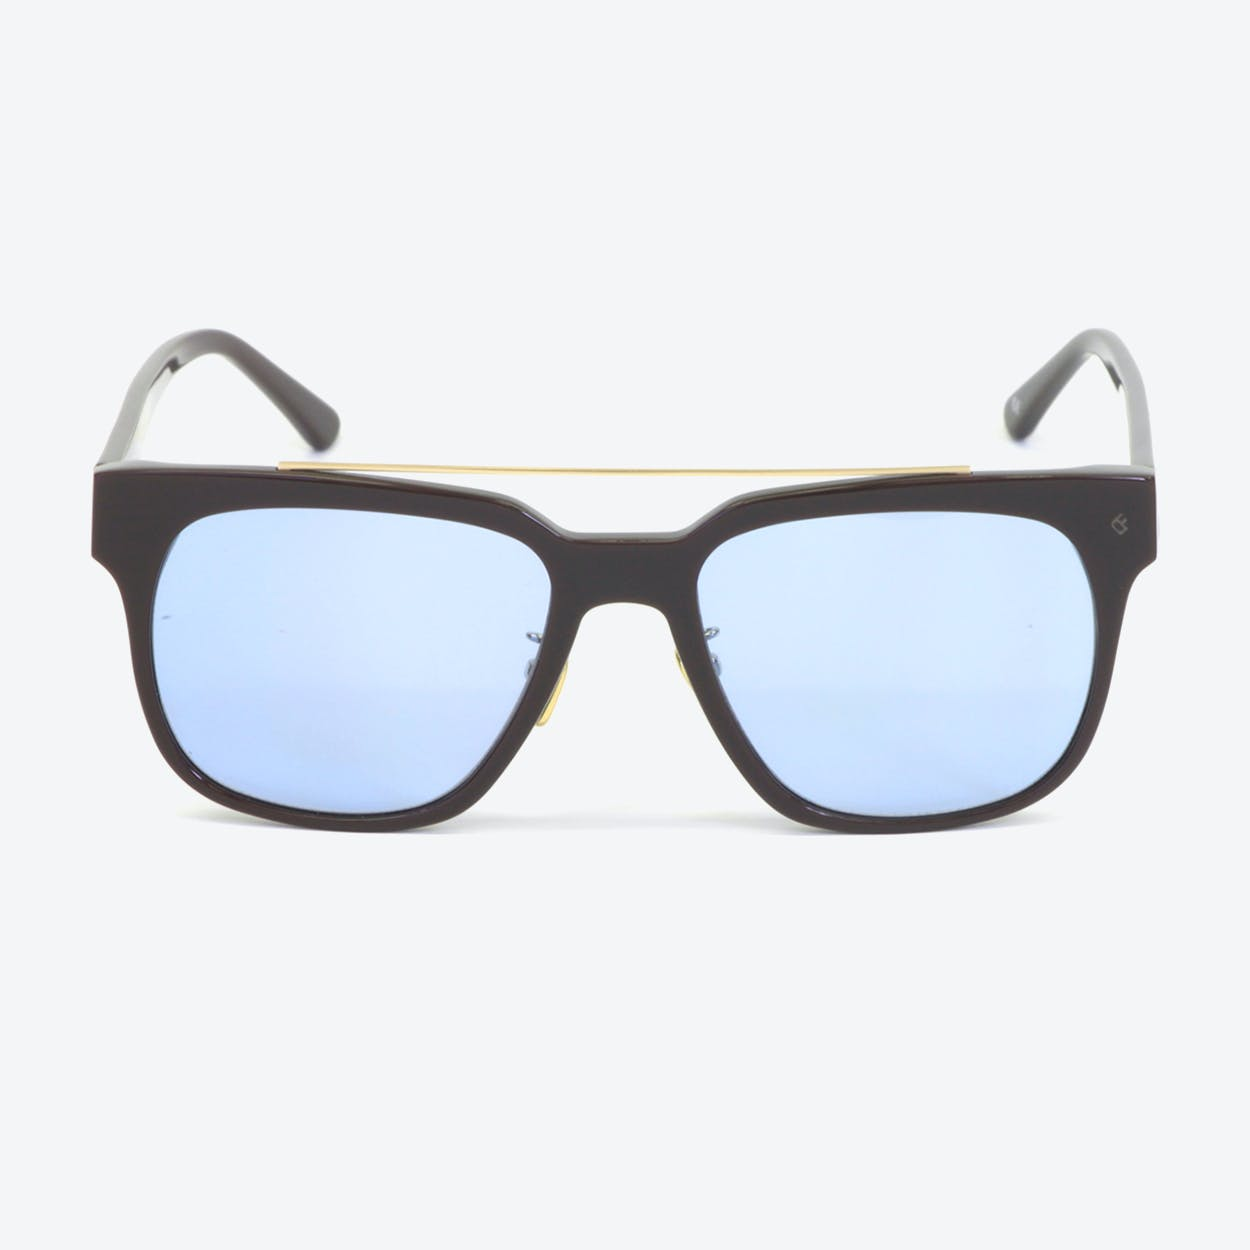 Sunglasses Sonder C02